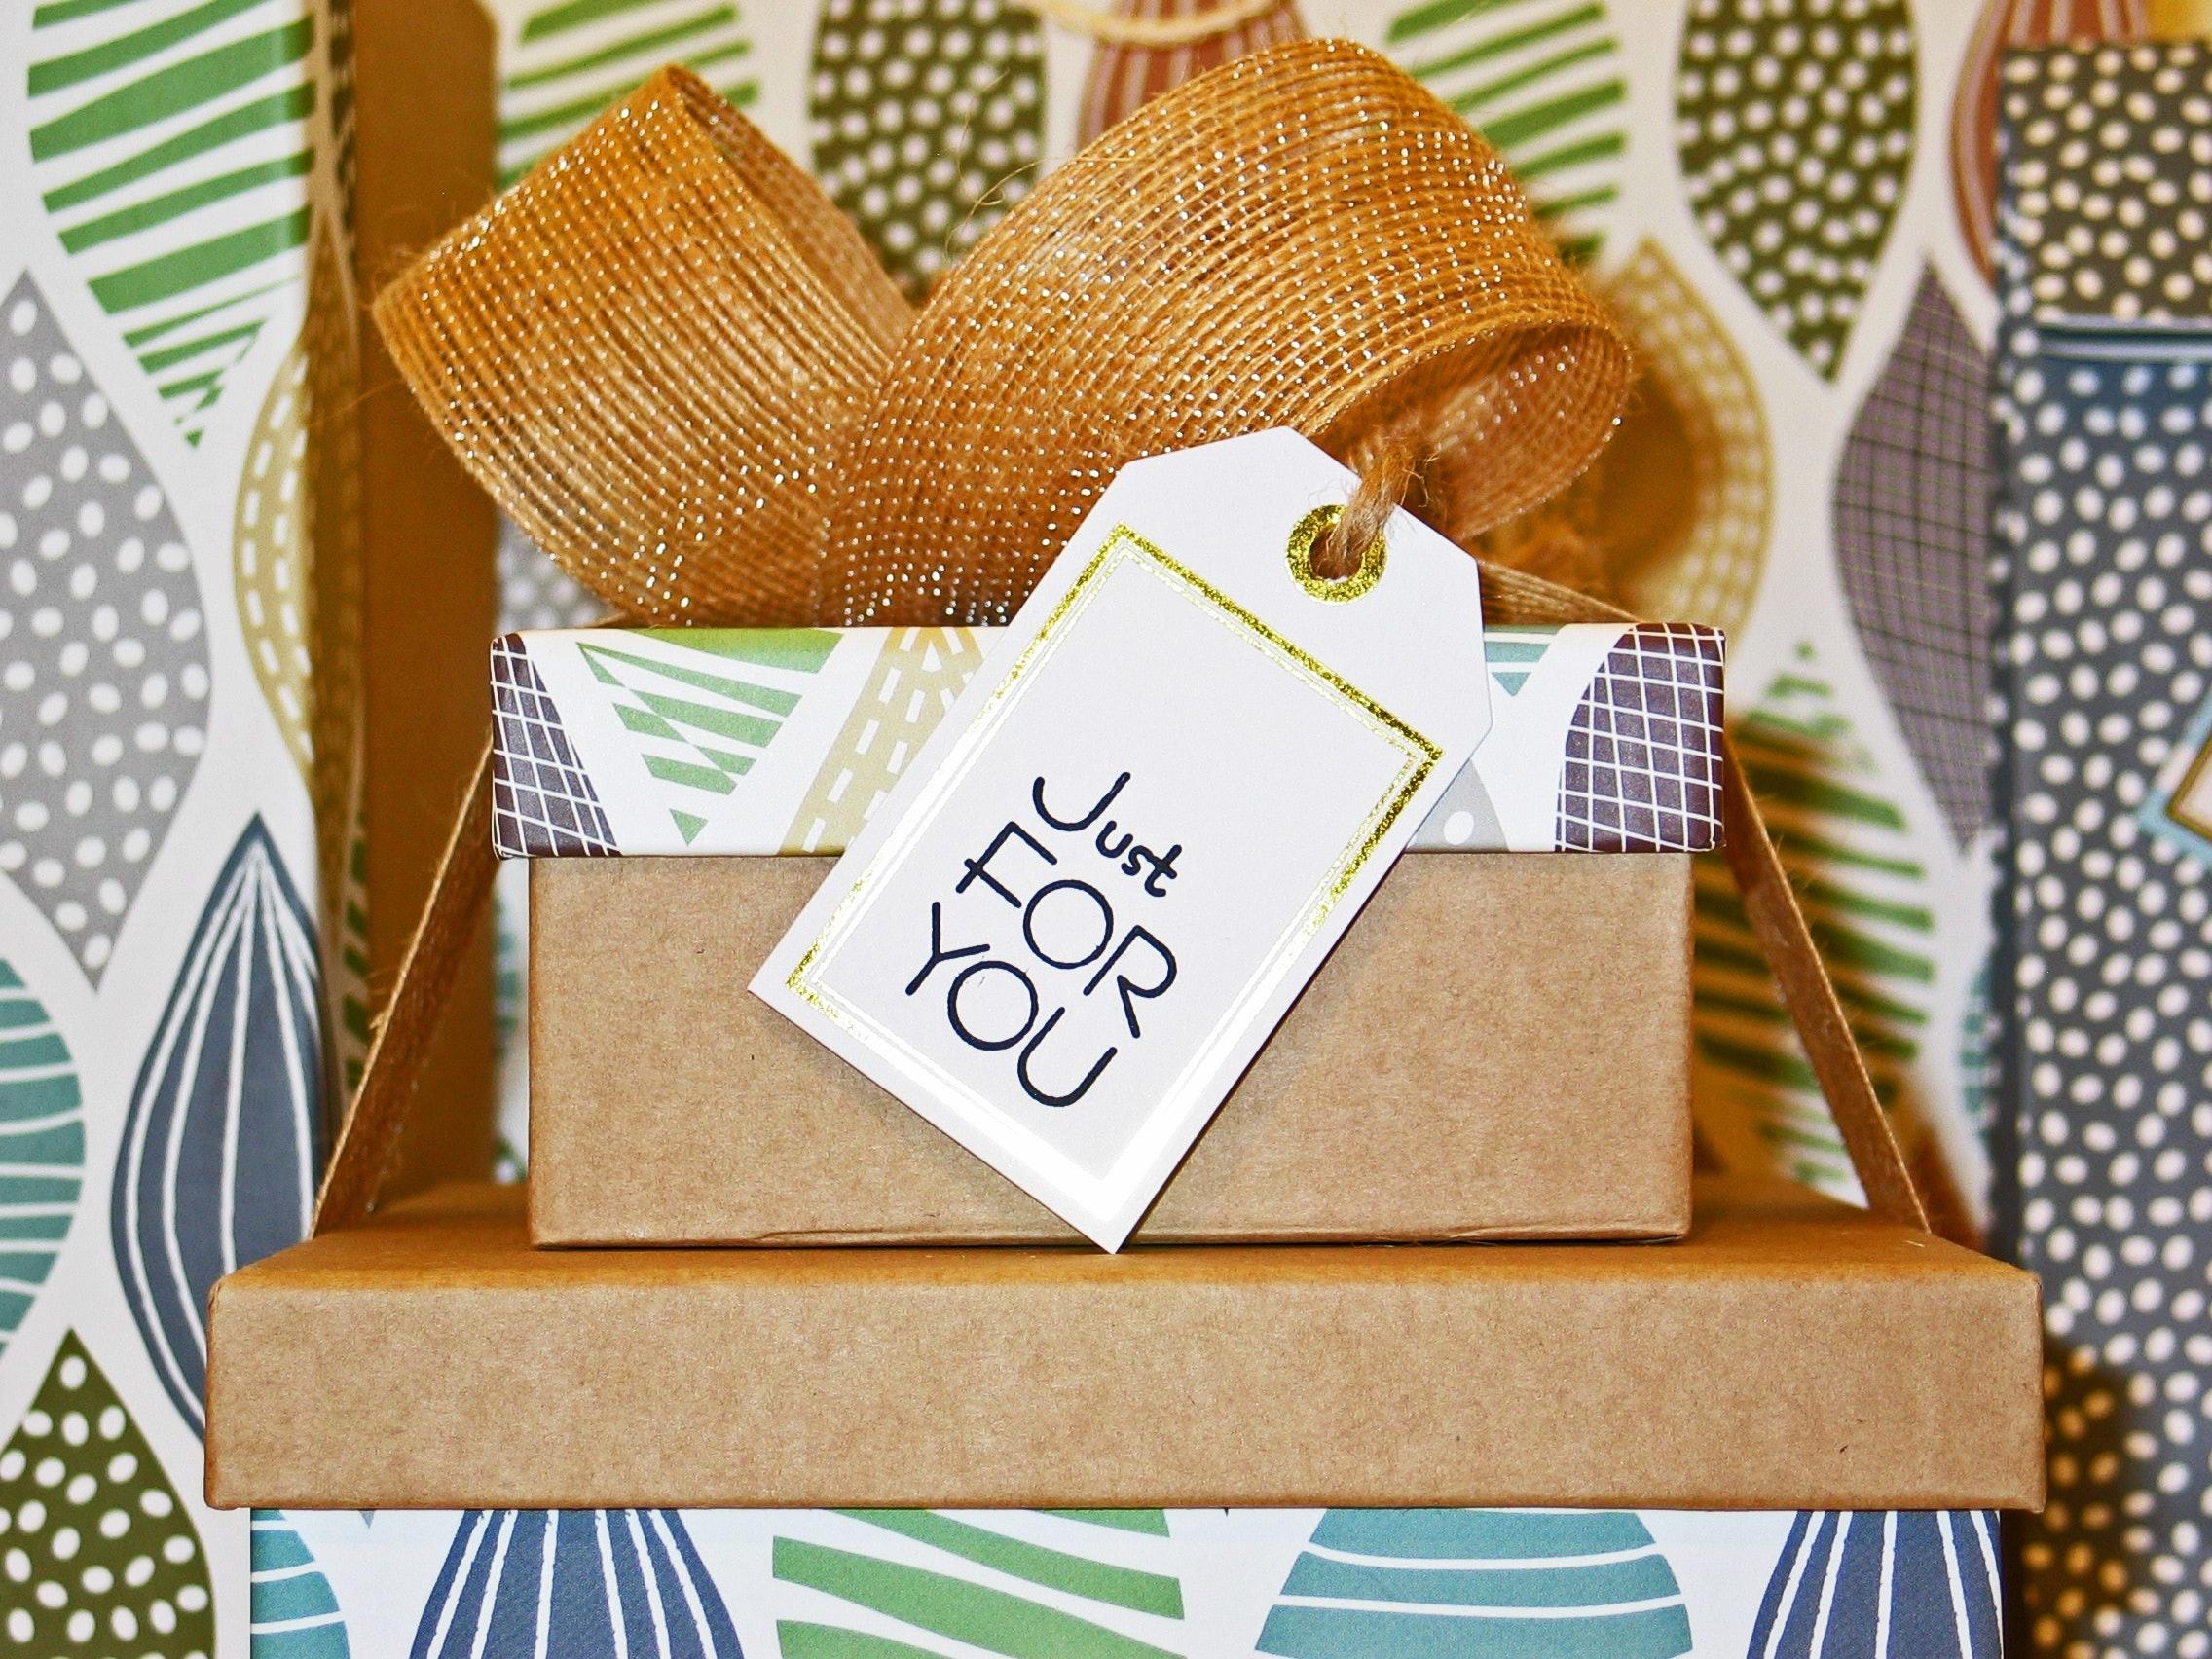 Elegir el merchandising ideal para tu evento